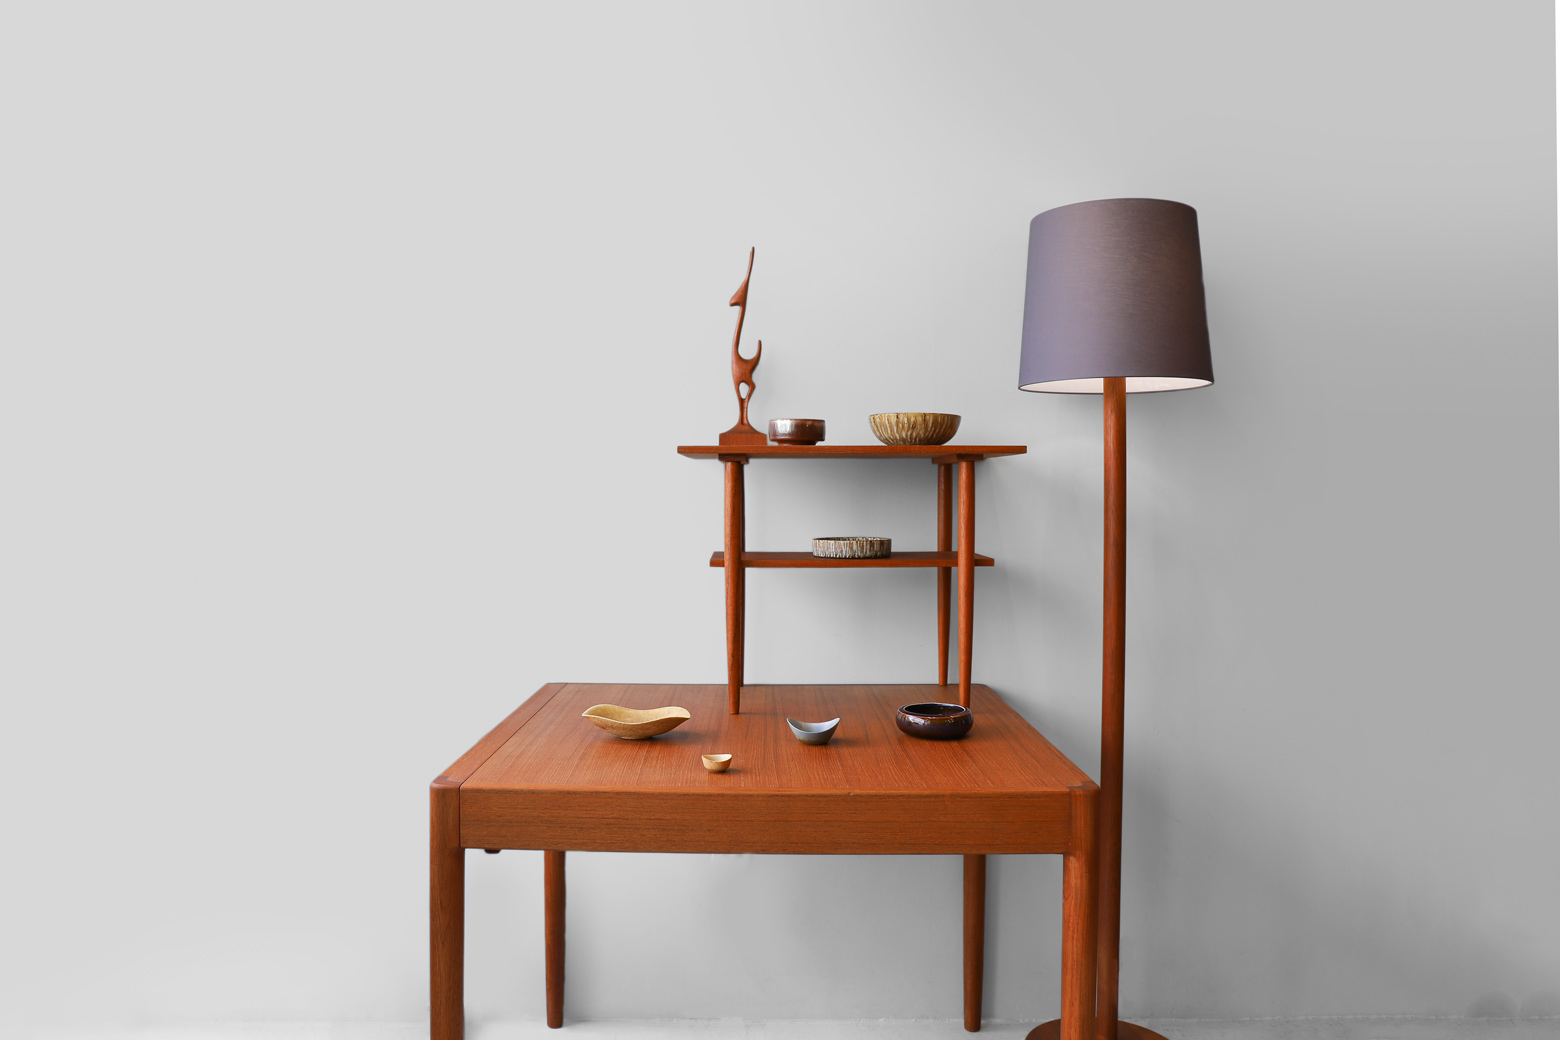 Rorstrand Gunnar Nylund/Carl-Harry Stalhane Vintage Stoneware/ロールストランド グンナー・ニールンド カールハリー・スタルハネ ヴィンテージ 陶器